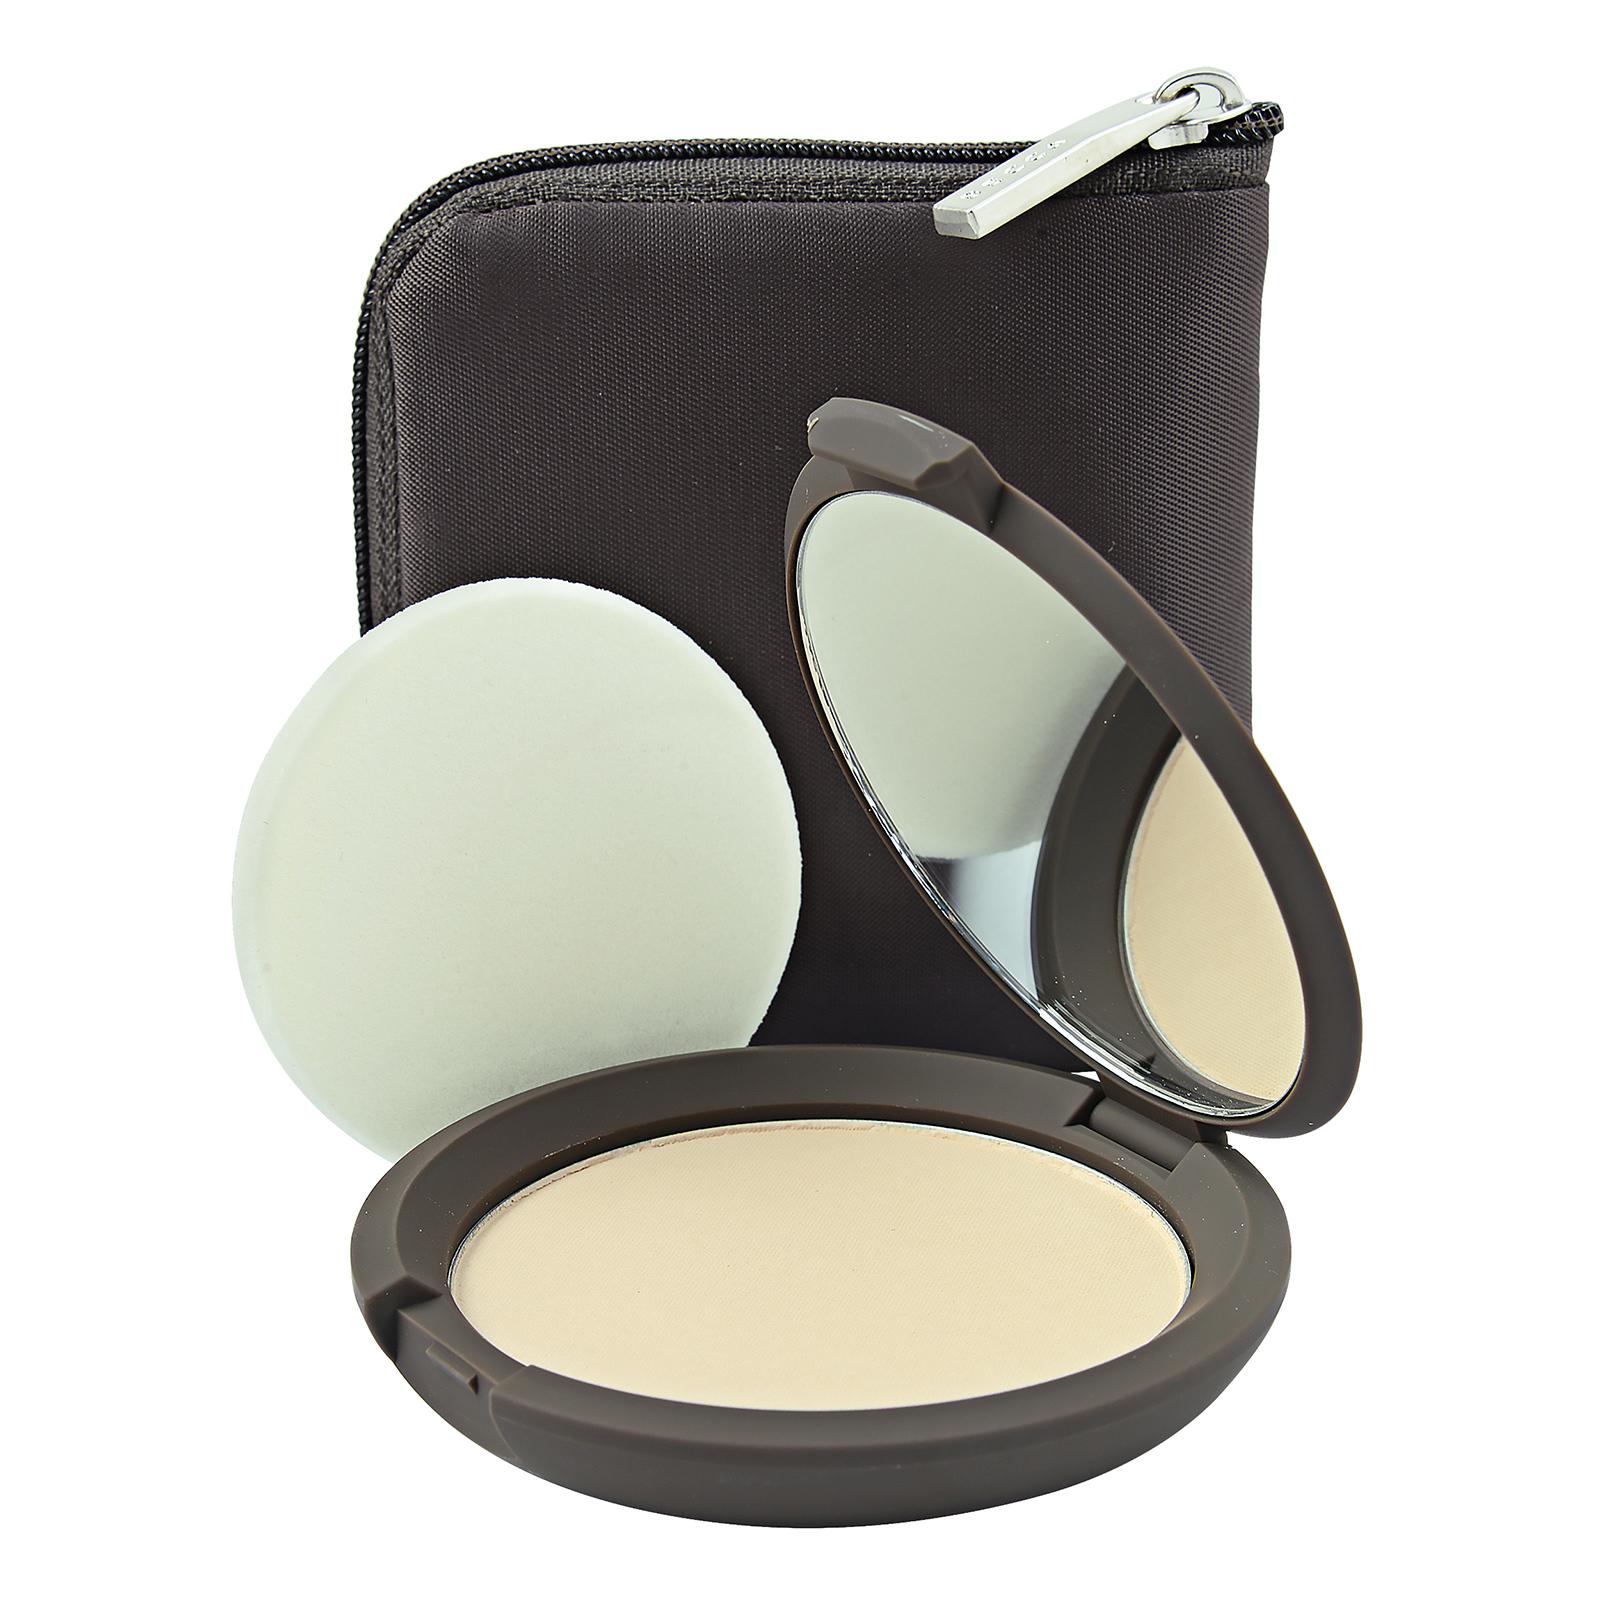 Becca  Perfect Skin Mineral Powder Foundation Porcelain, 0.33oz, 9.5g